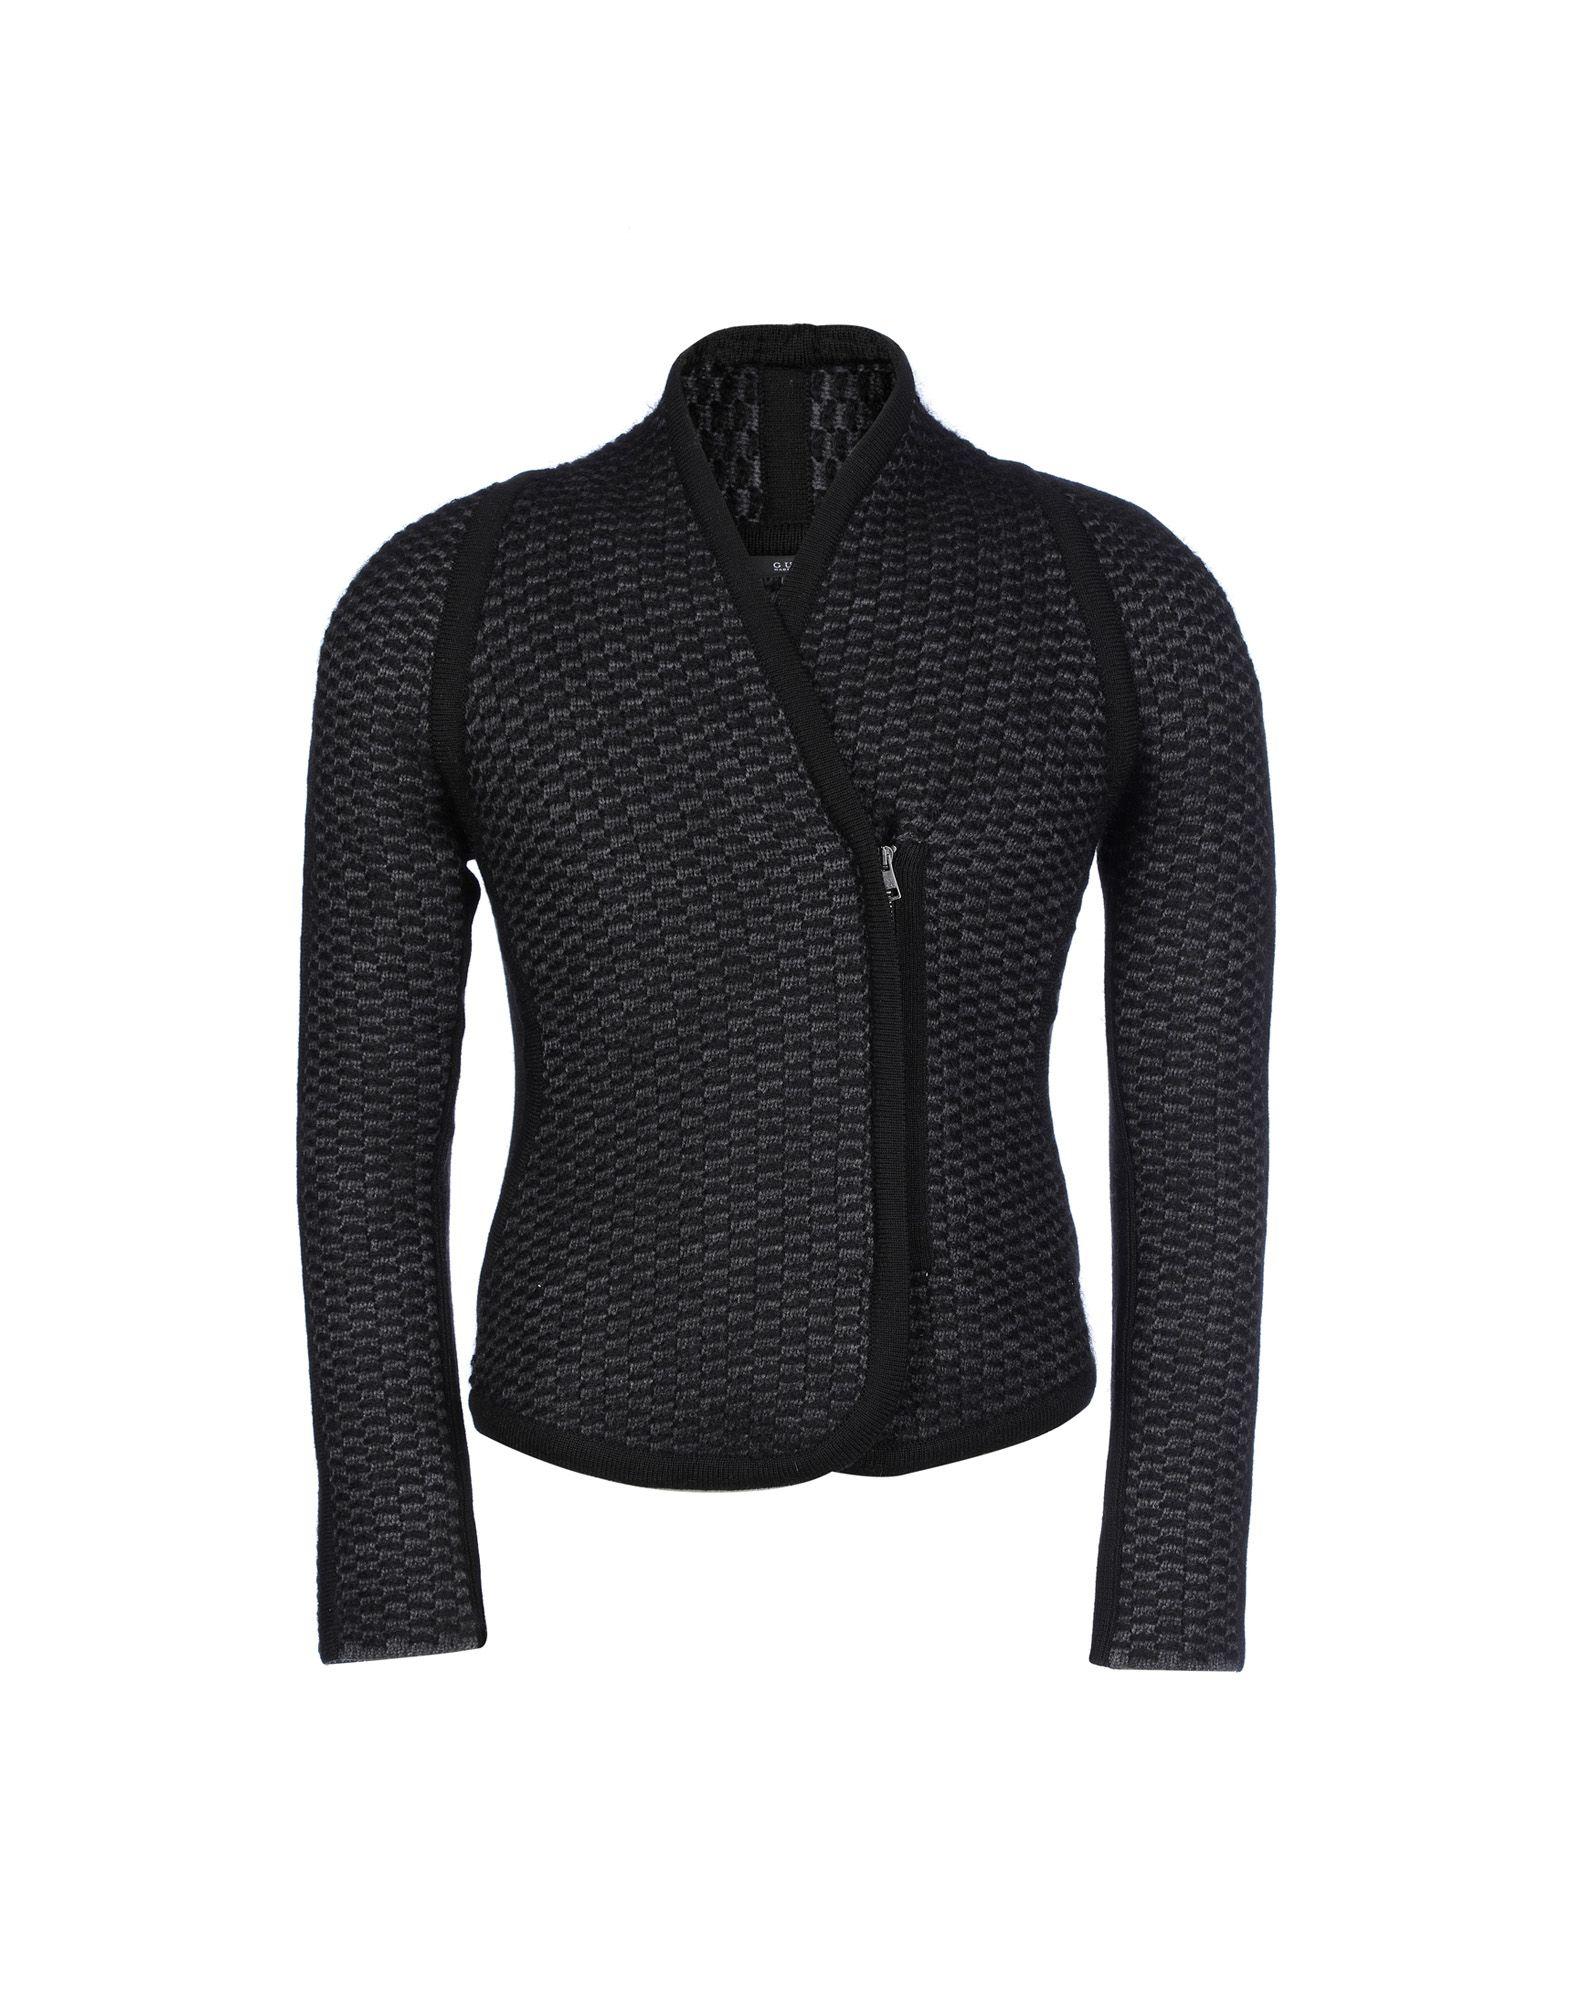 f1f12e375928 Gucci Sweater - Men Gucci Sweaters online on YOOX United States ...